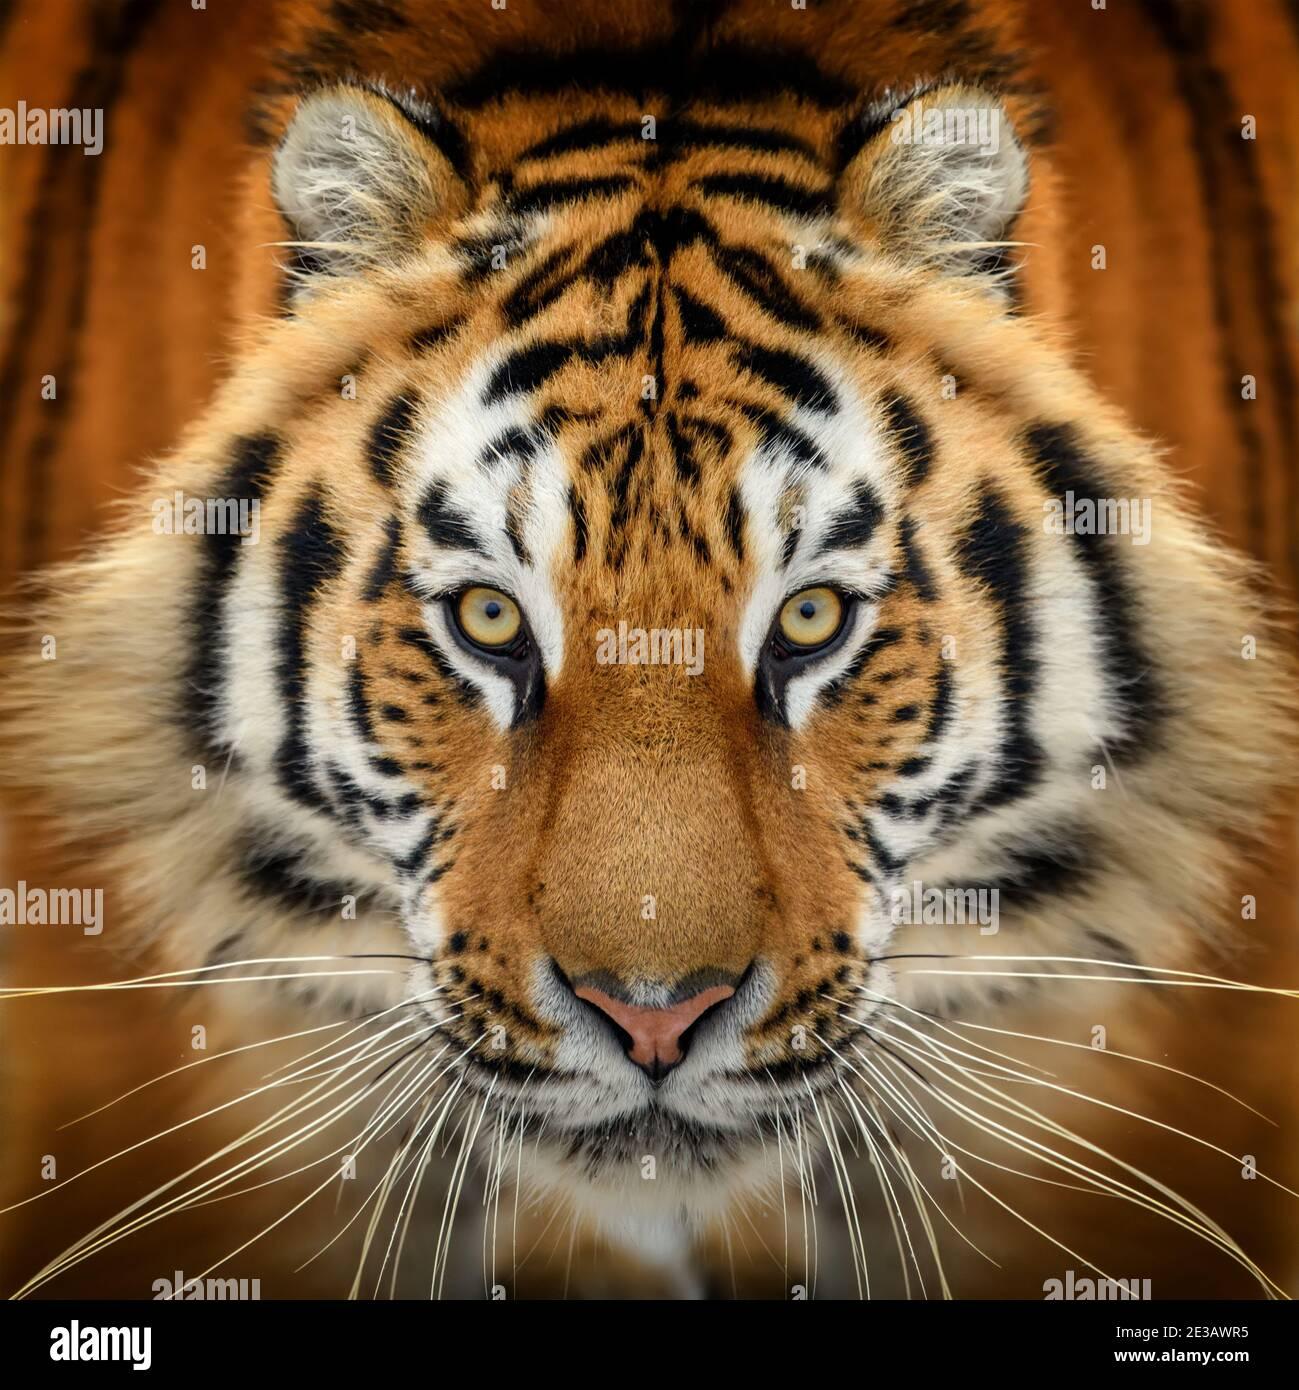 Primer plano retrato de tigre. Animal mirando en la cámara. Peligro animal en el hábitat de la naturaleza Foto de stock